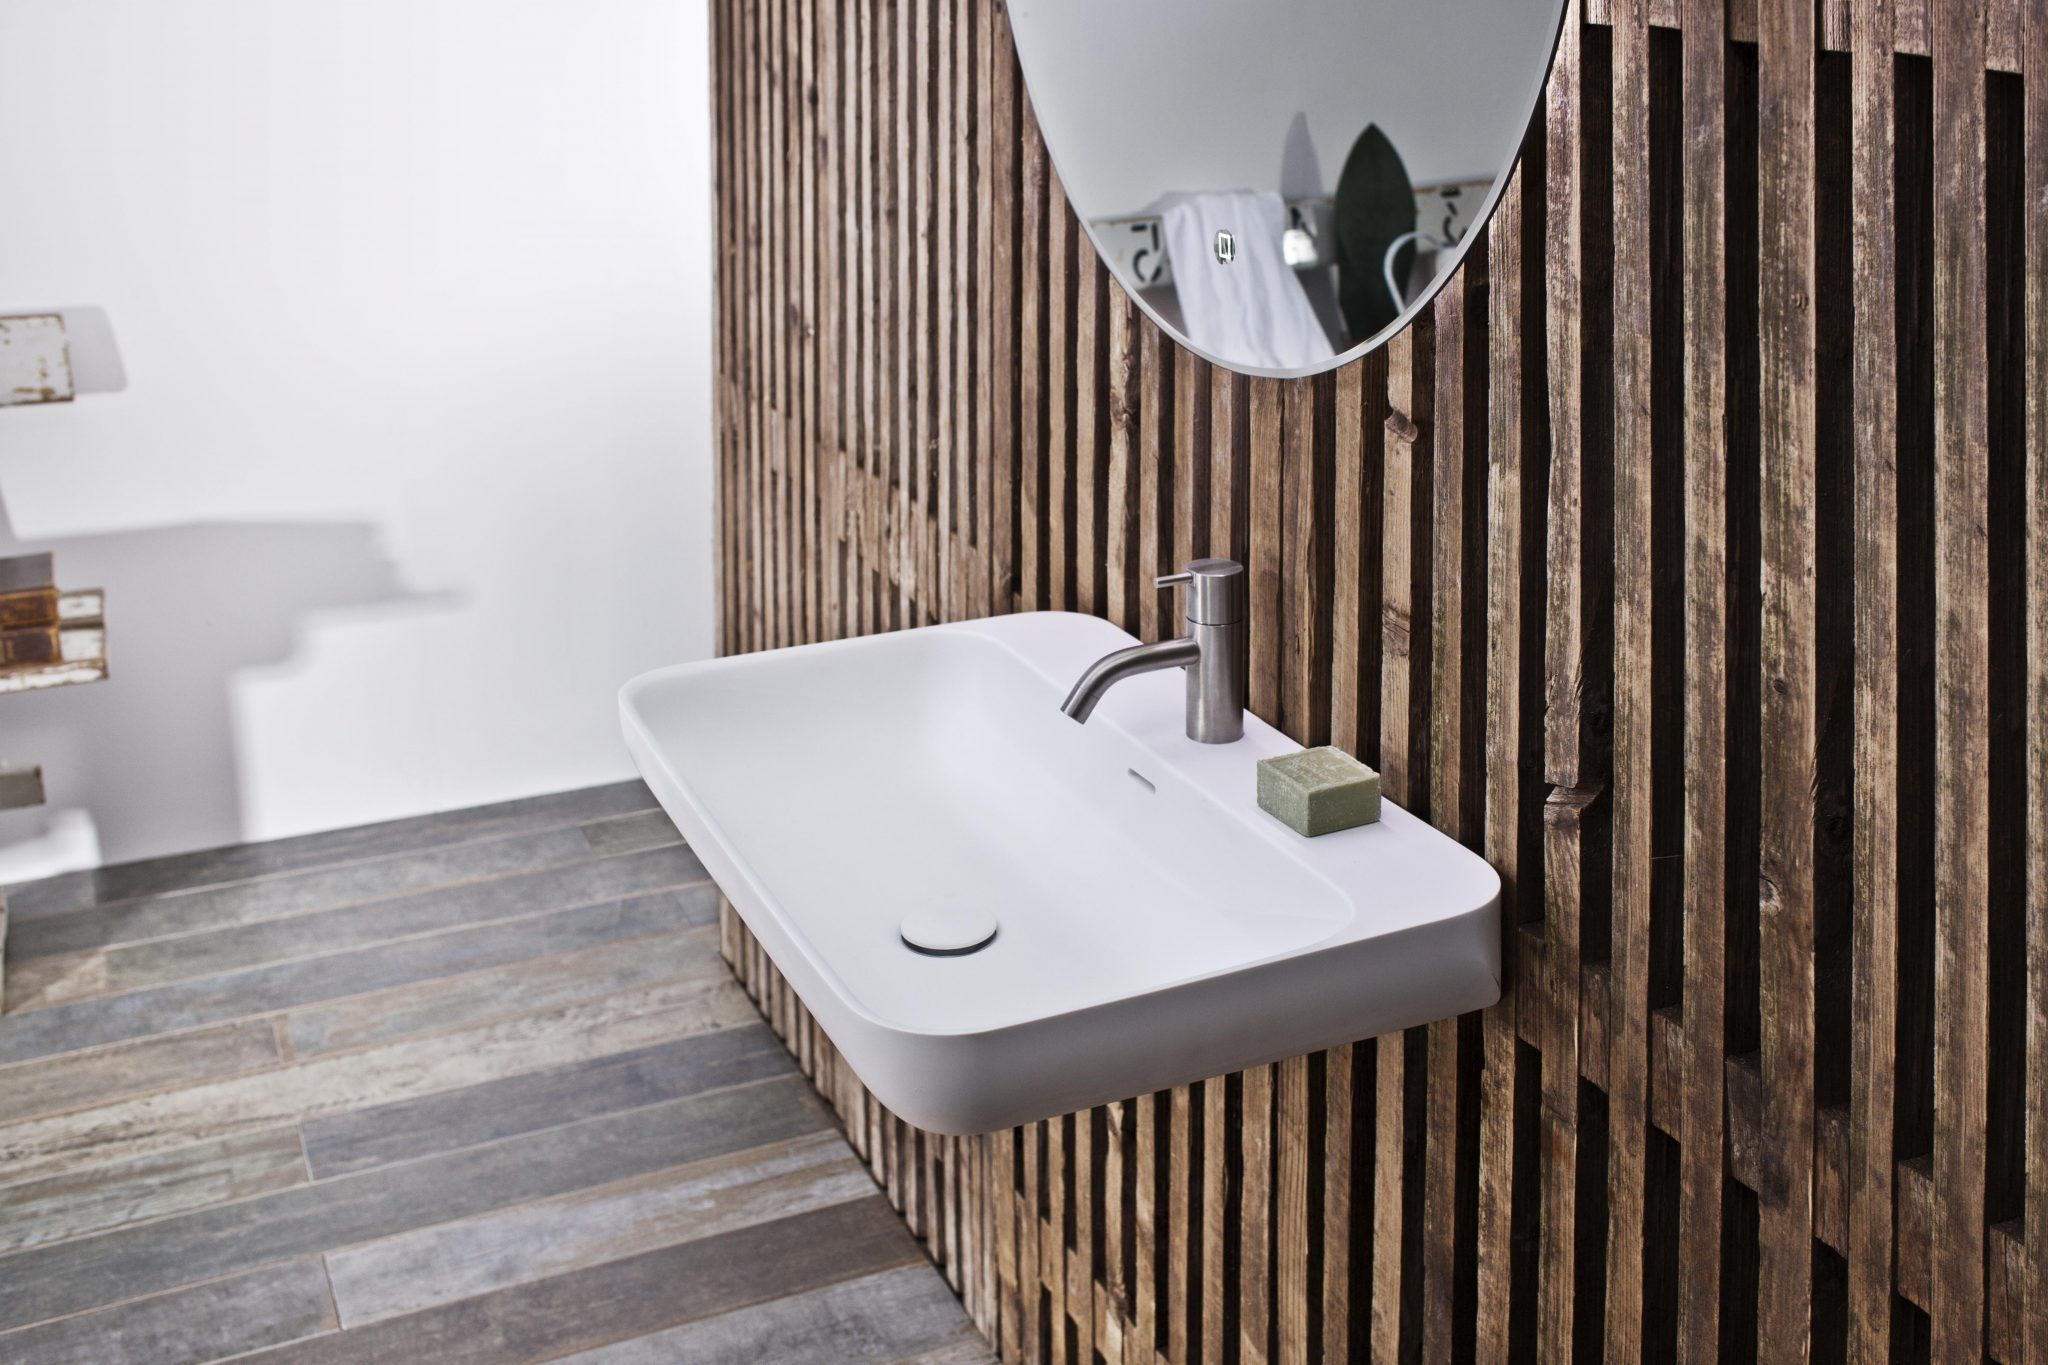 en-60-wash-basin-from-copenhagen-bath_26556869695_o